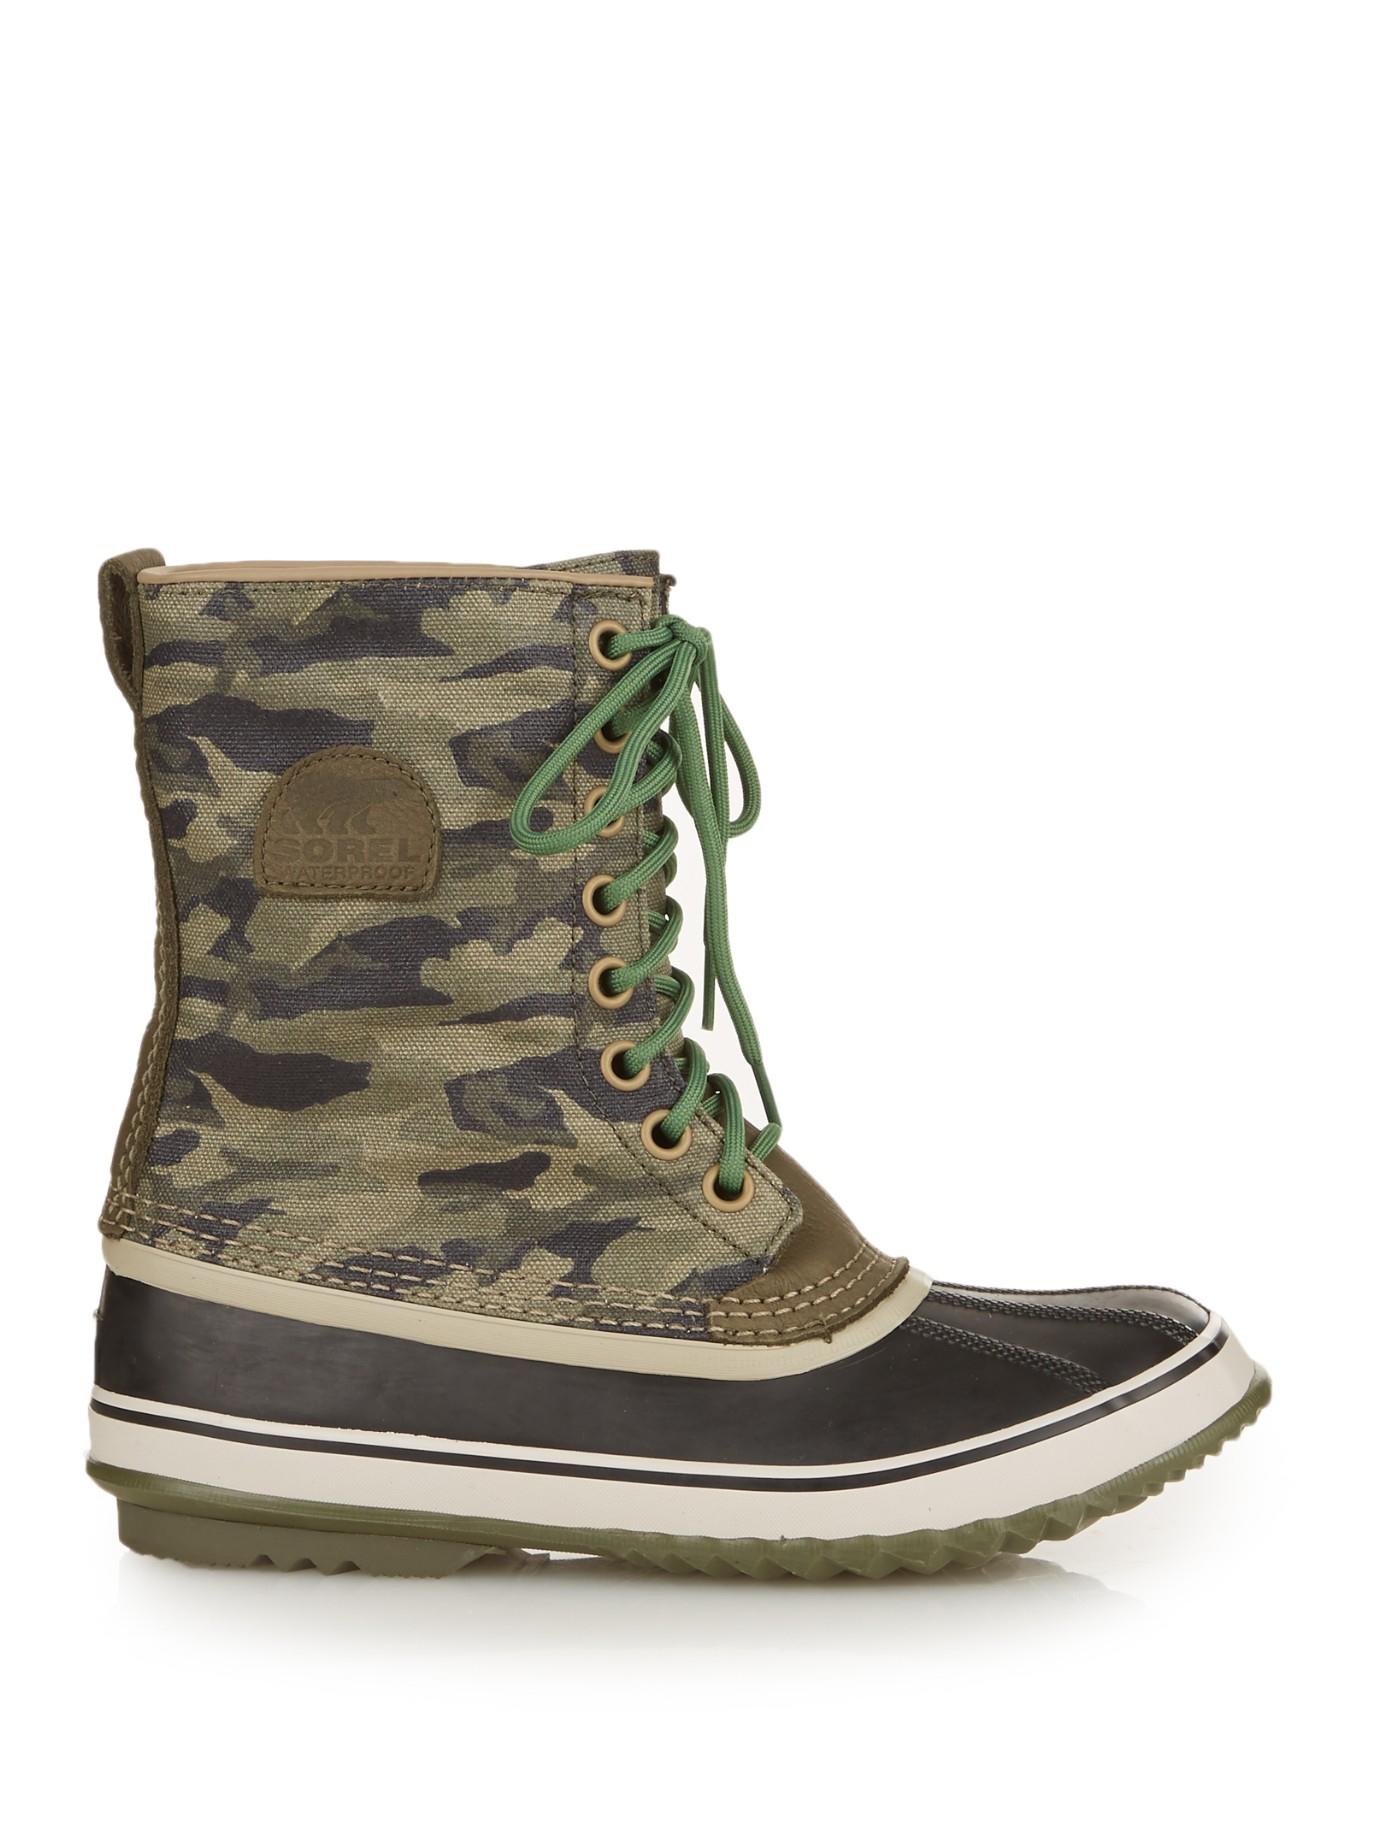 19e490667a411 Sorel 1964 Premium Camouflage-Print Ankle Boots - Lyst